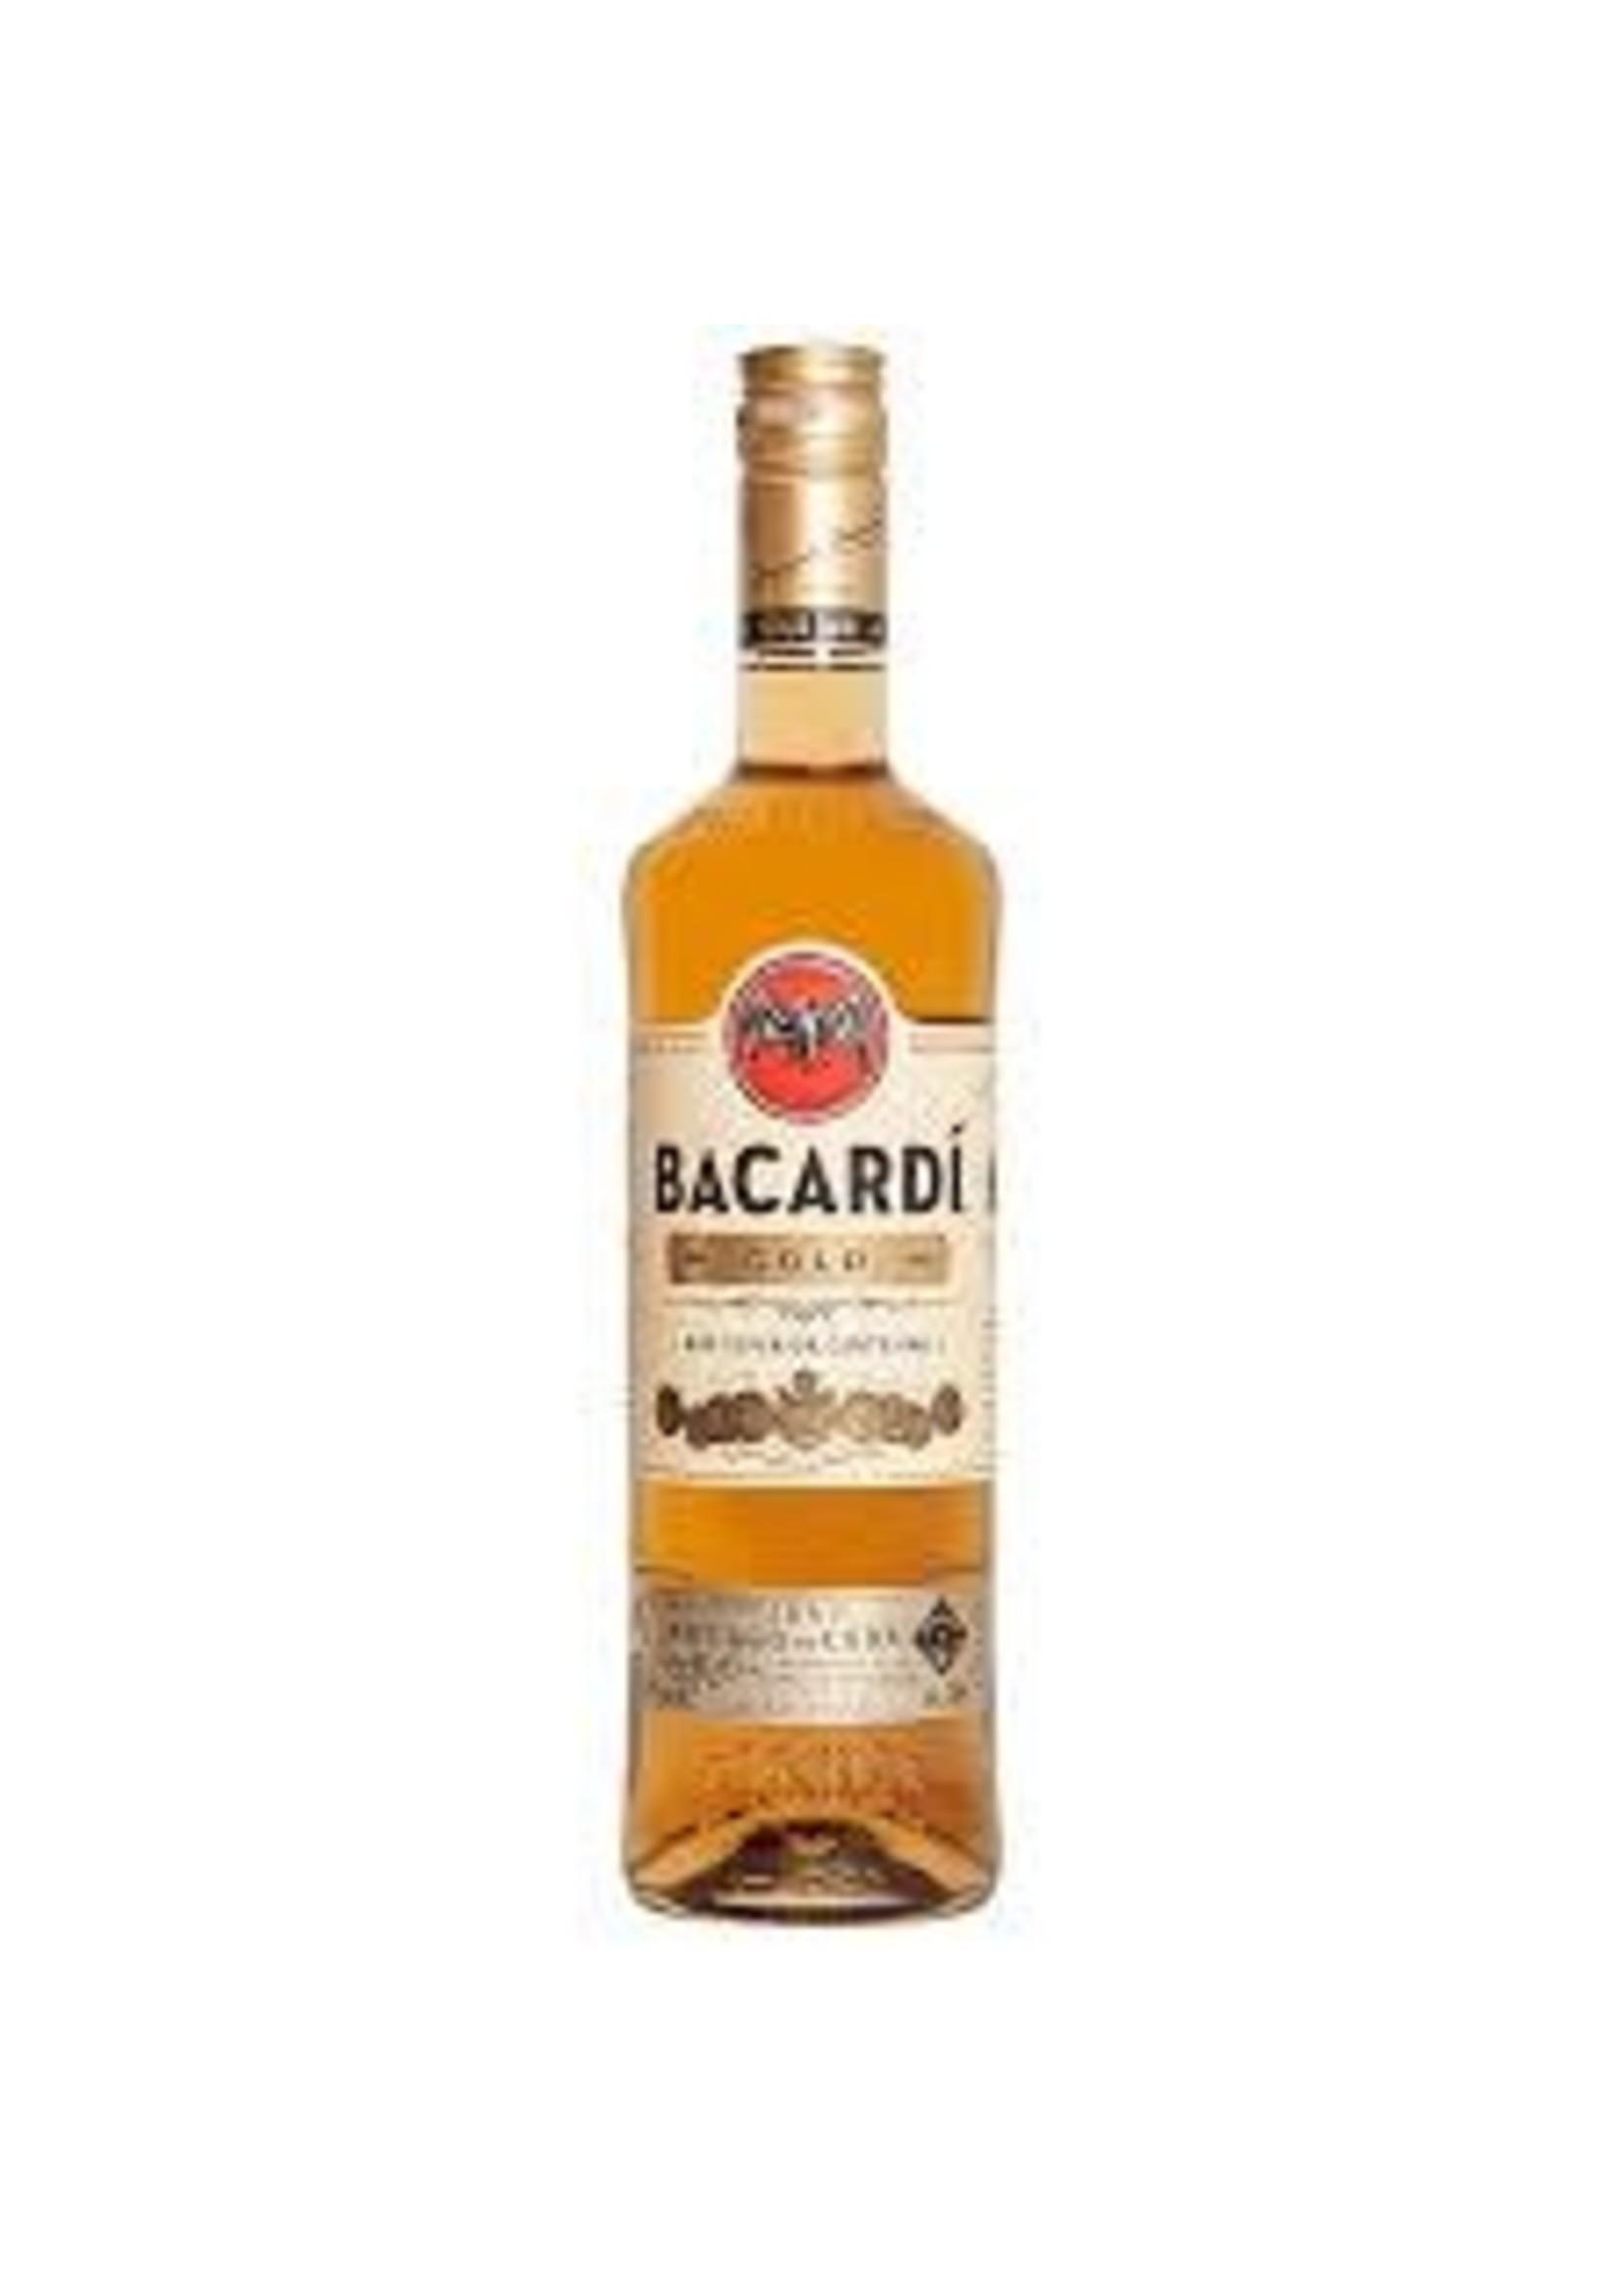 BACARDI Bacardi / Gold